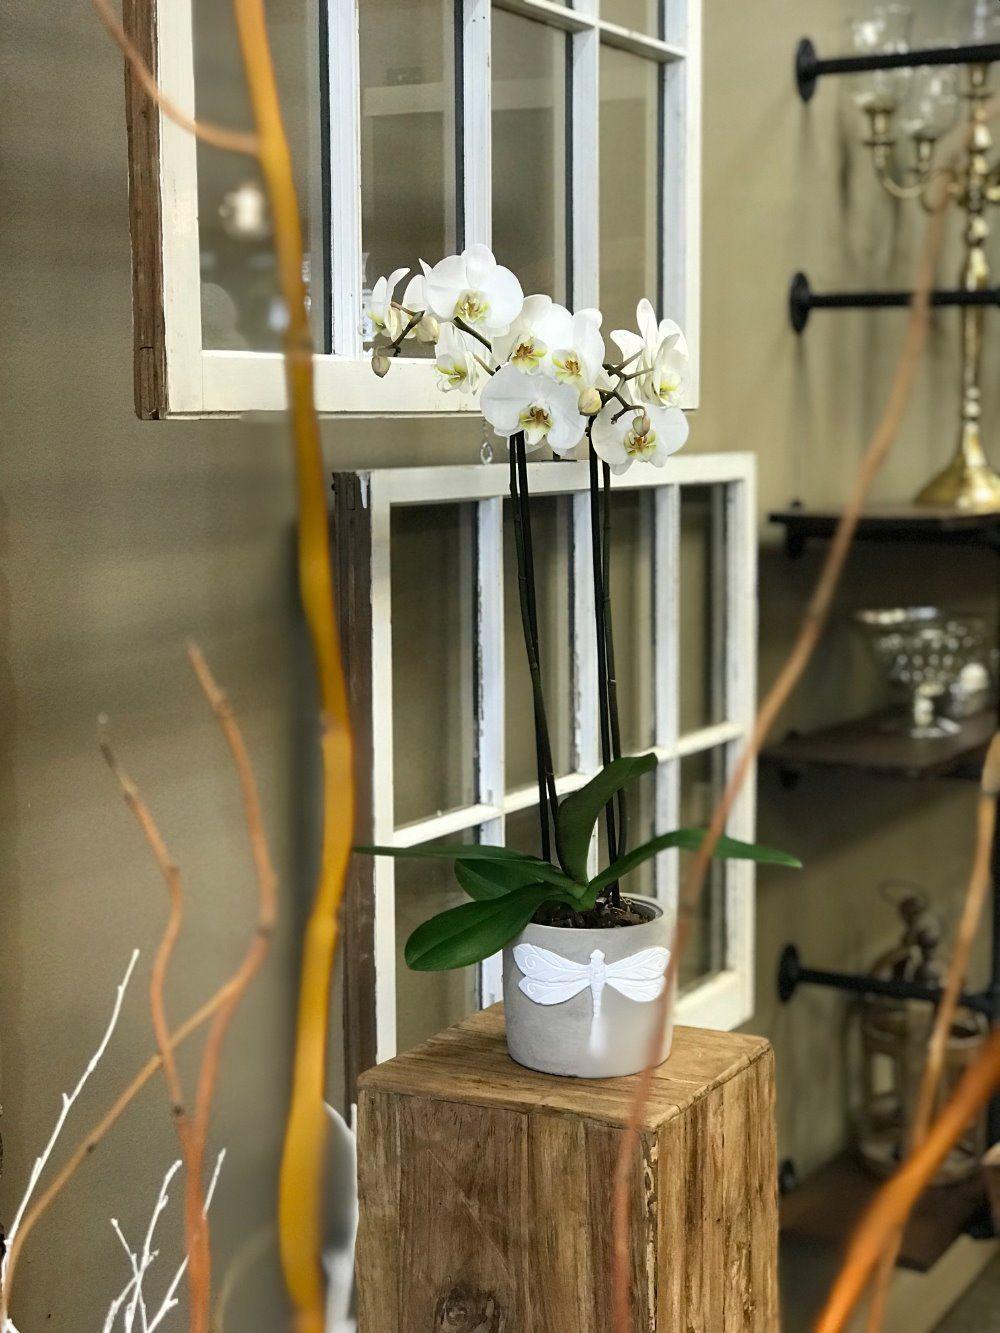 225 & Potted Orchid Ashland Florist: The Fuchsia Peony -Flower ...